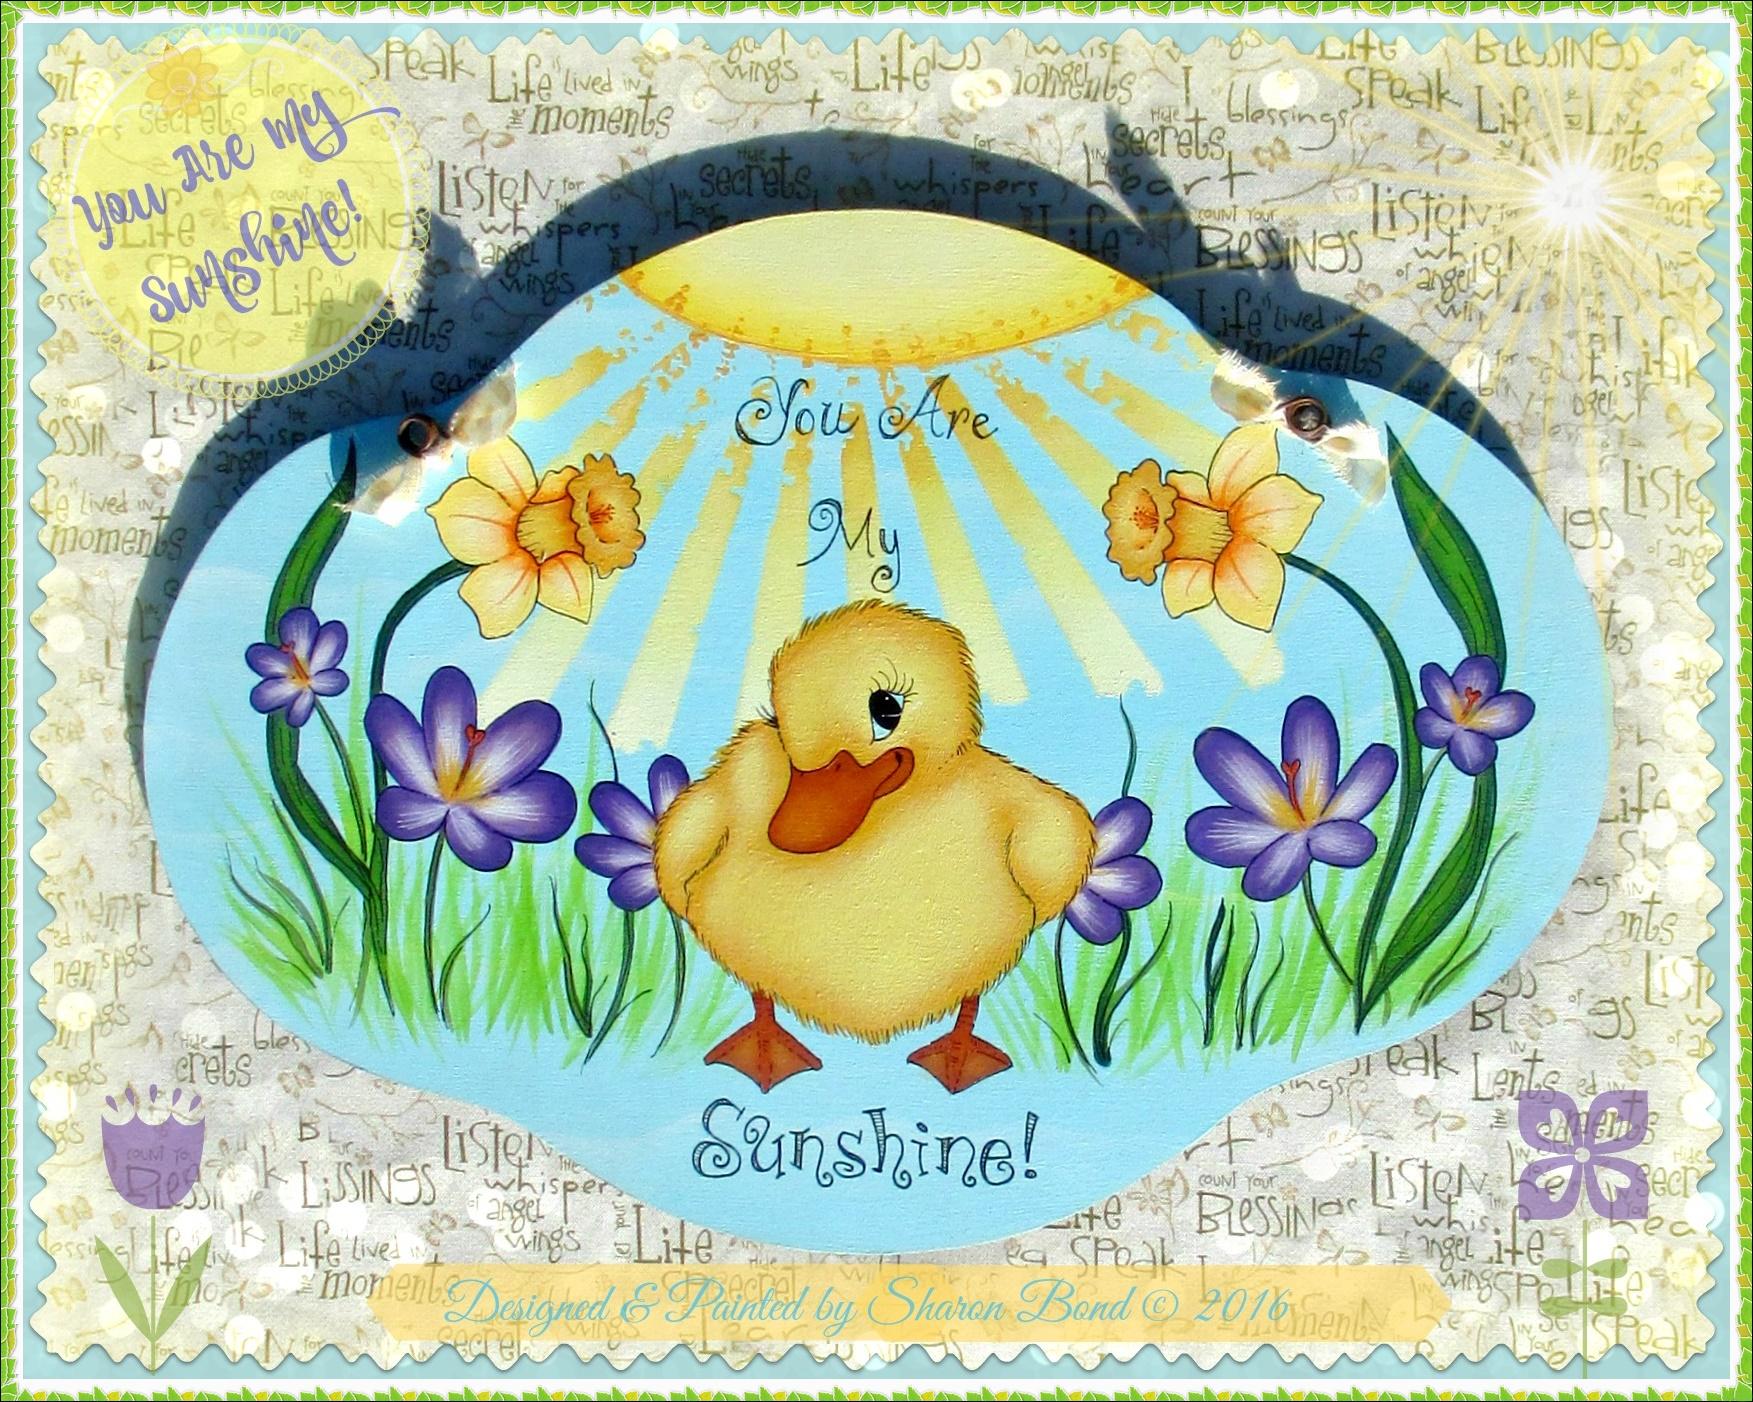 You Are My Sunshine! - E-Packet - Sharon Bond